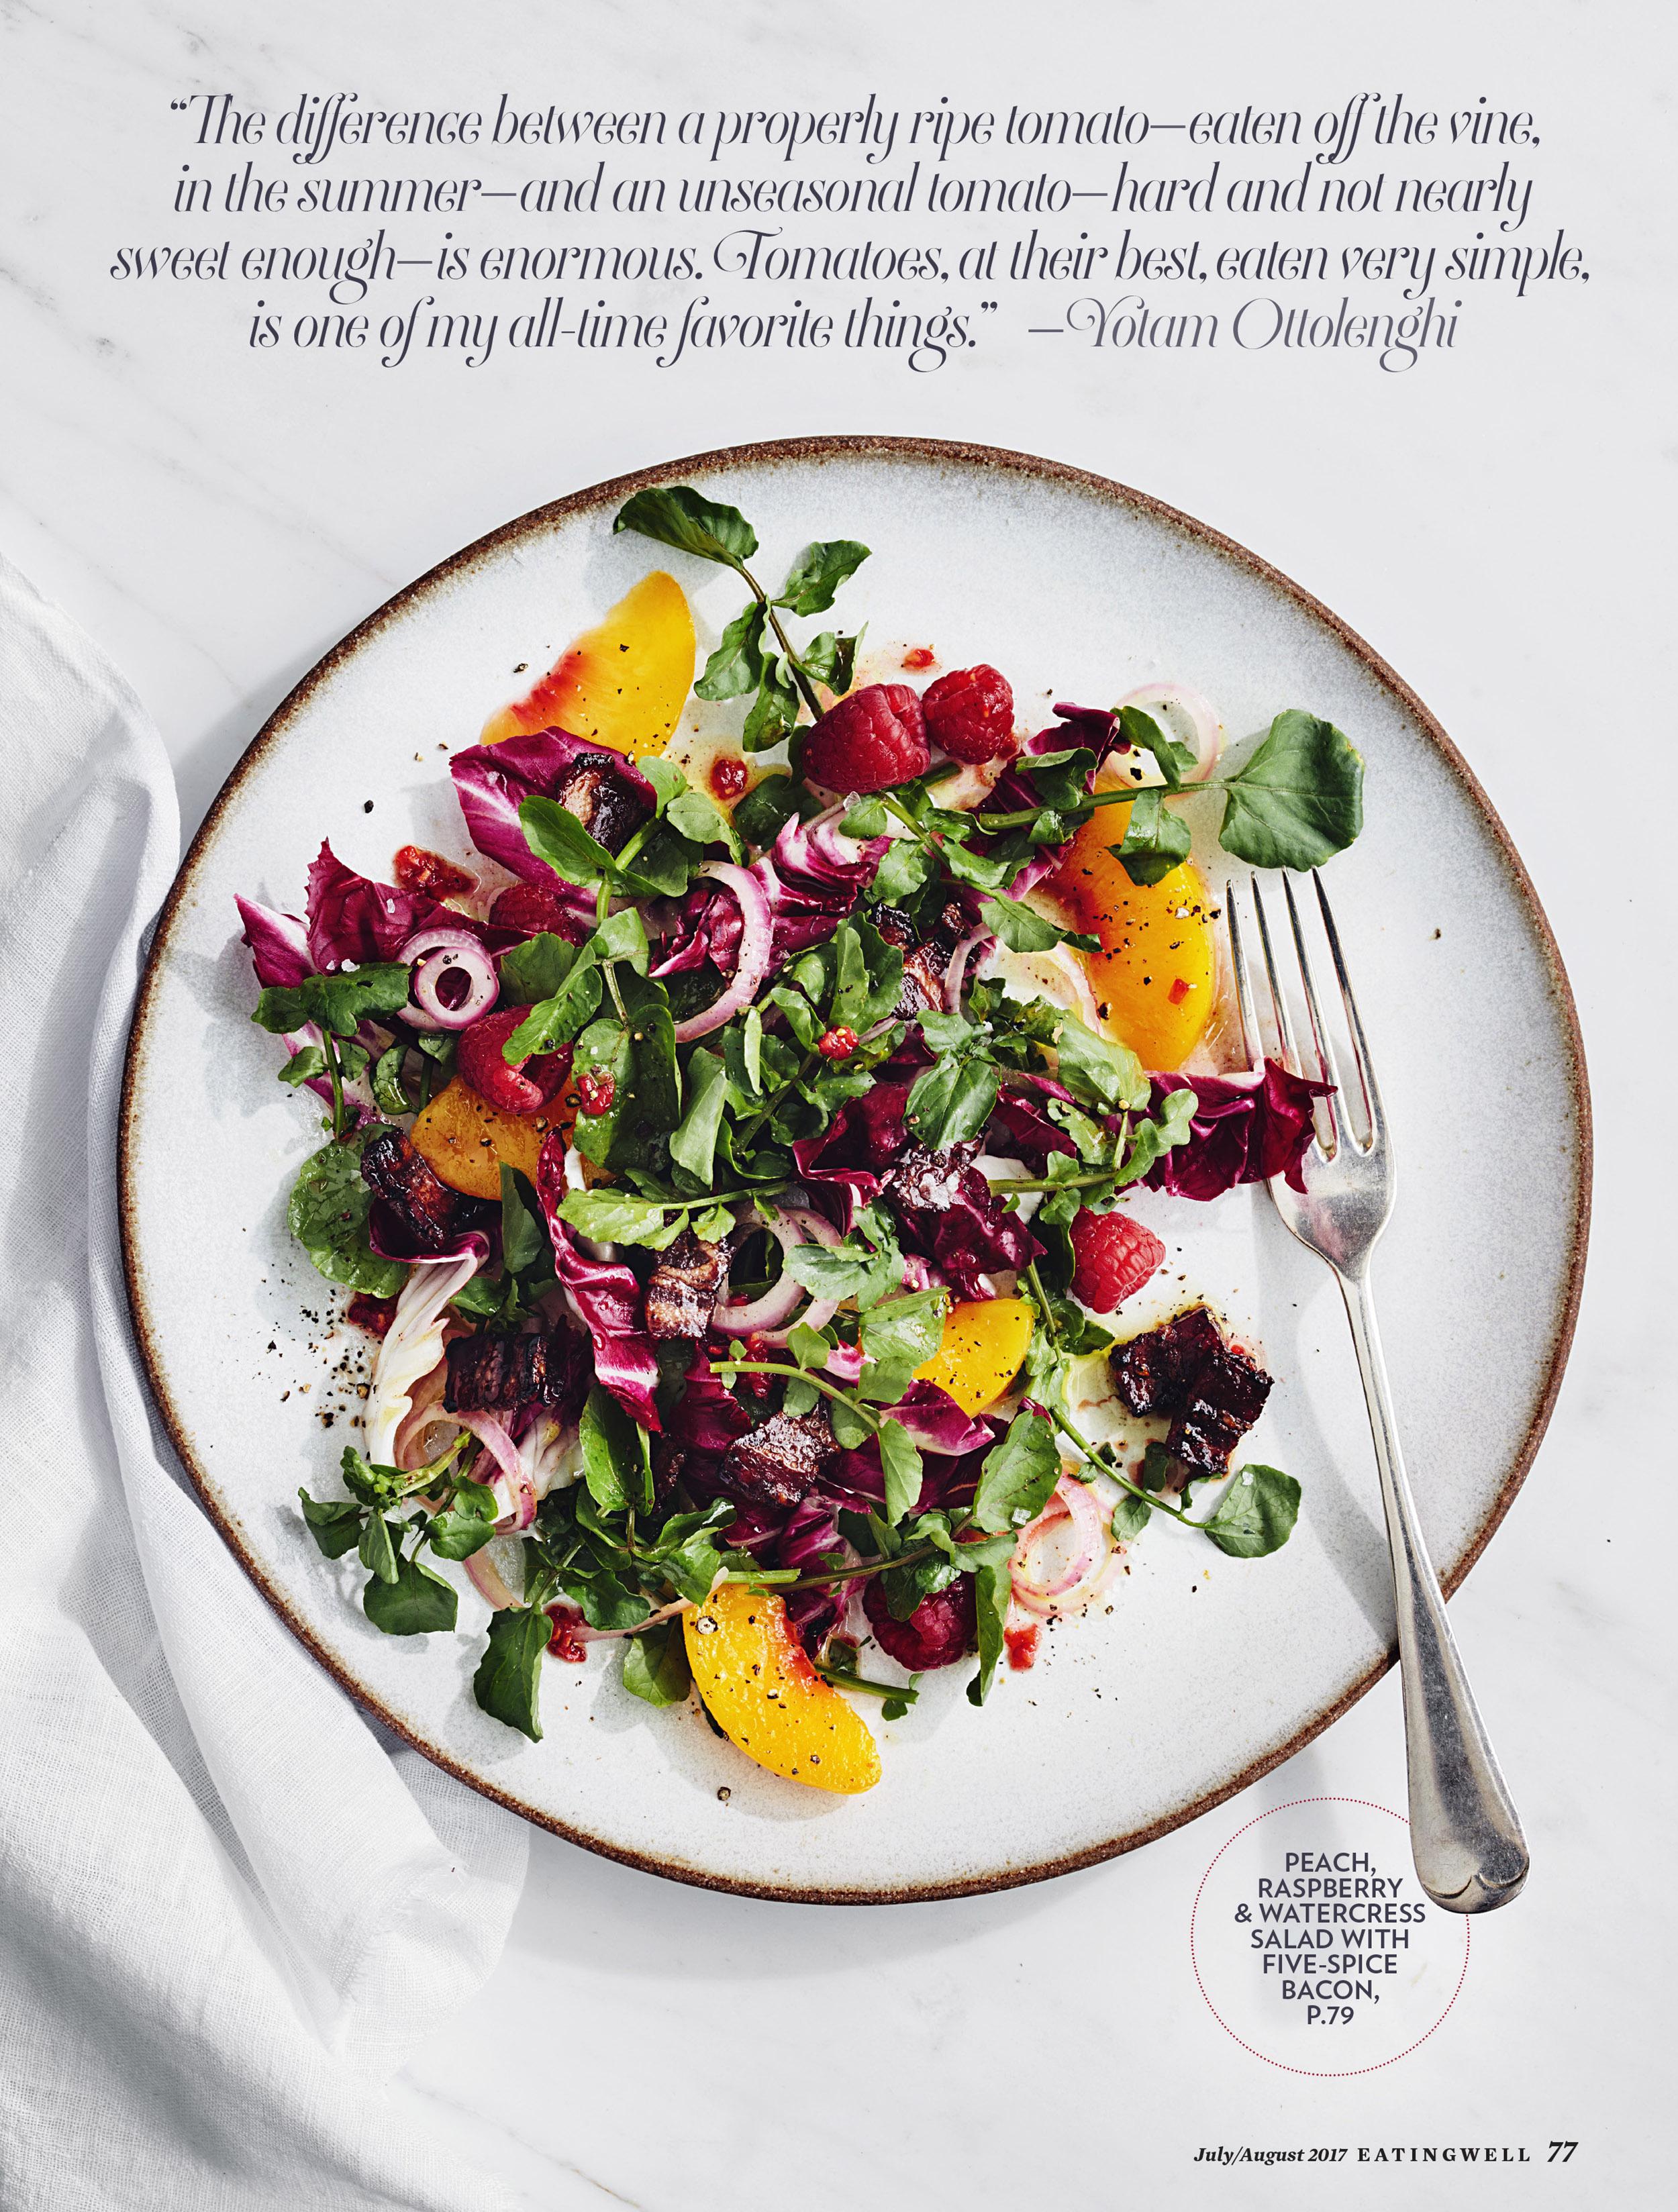 074-079 EW_JA17_feature_Fruit Salads QFCCcx-4 copy.jpg